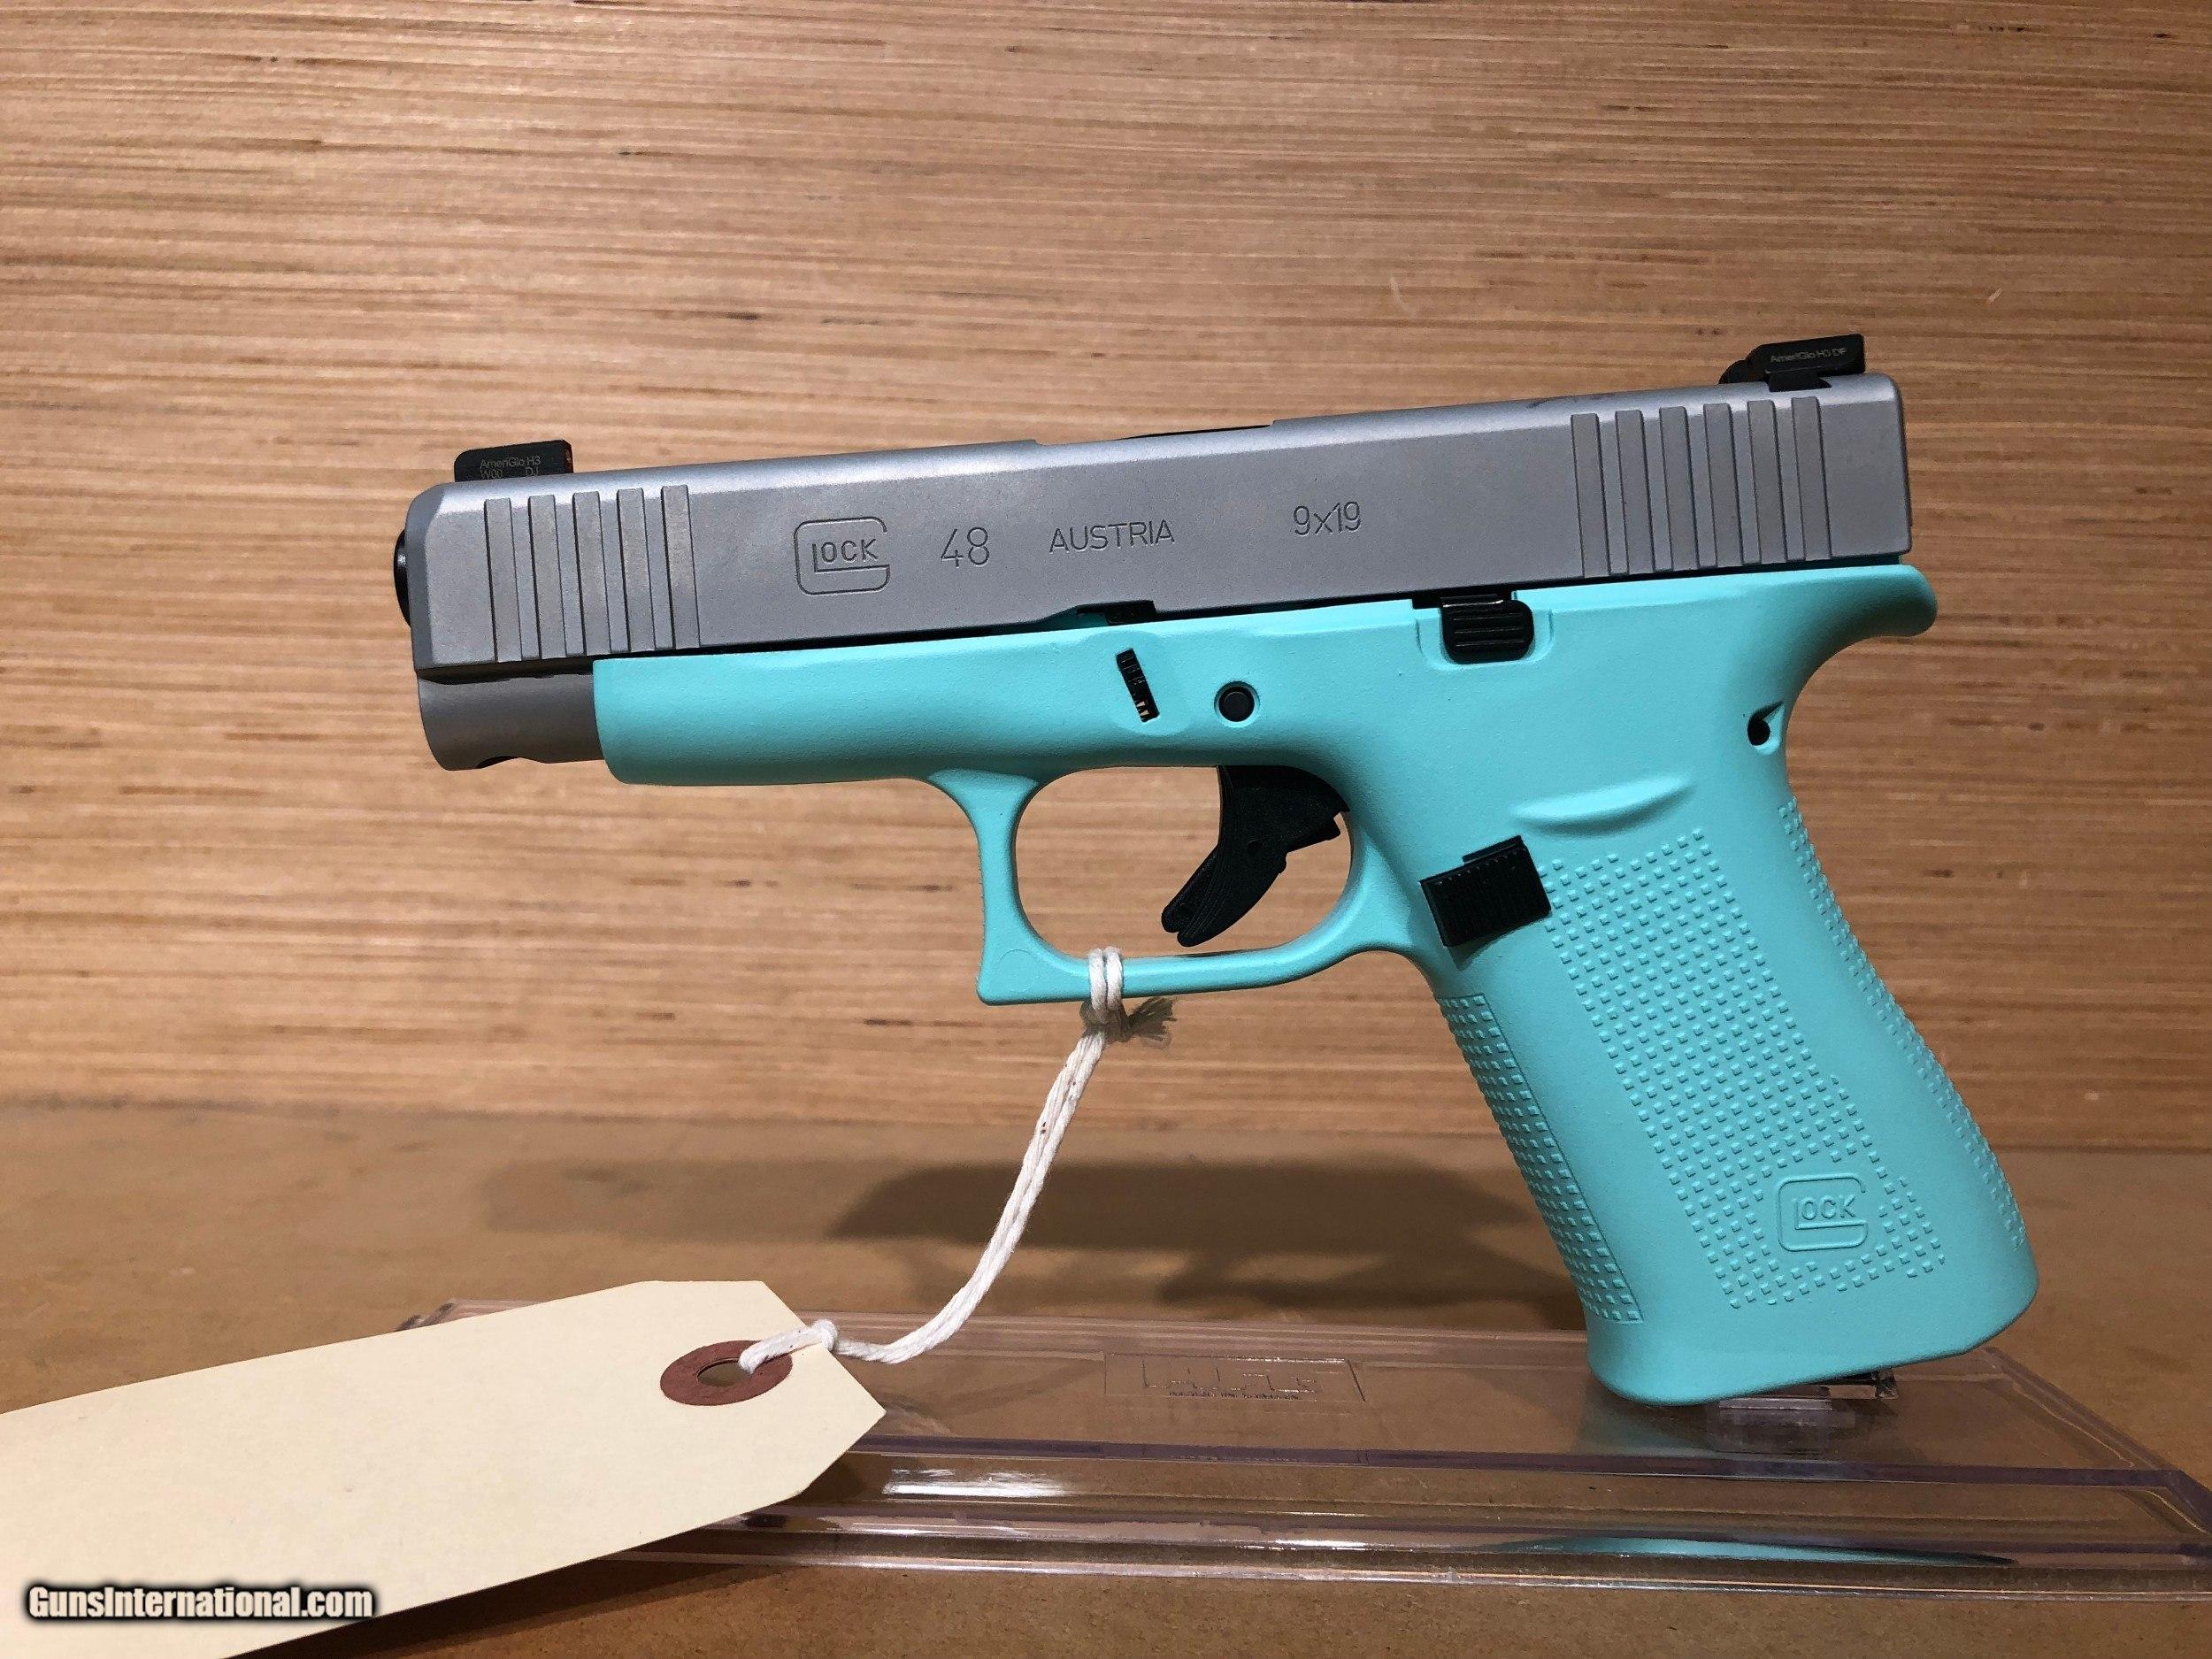 GLOCK G48 ROBIN EGG BLUE 4 17 10RD AMGLOW 9MM